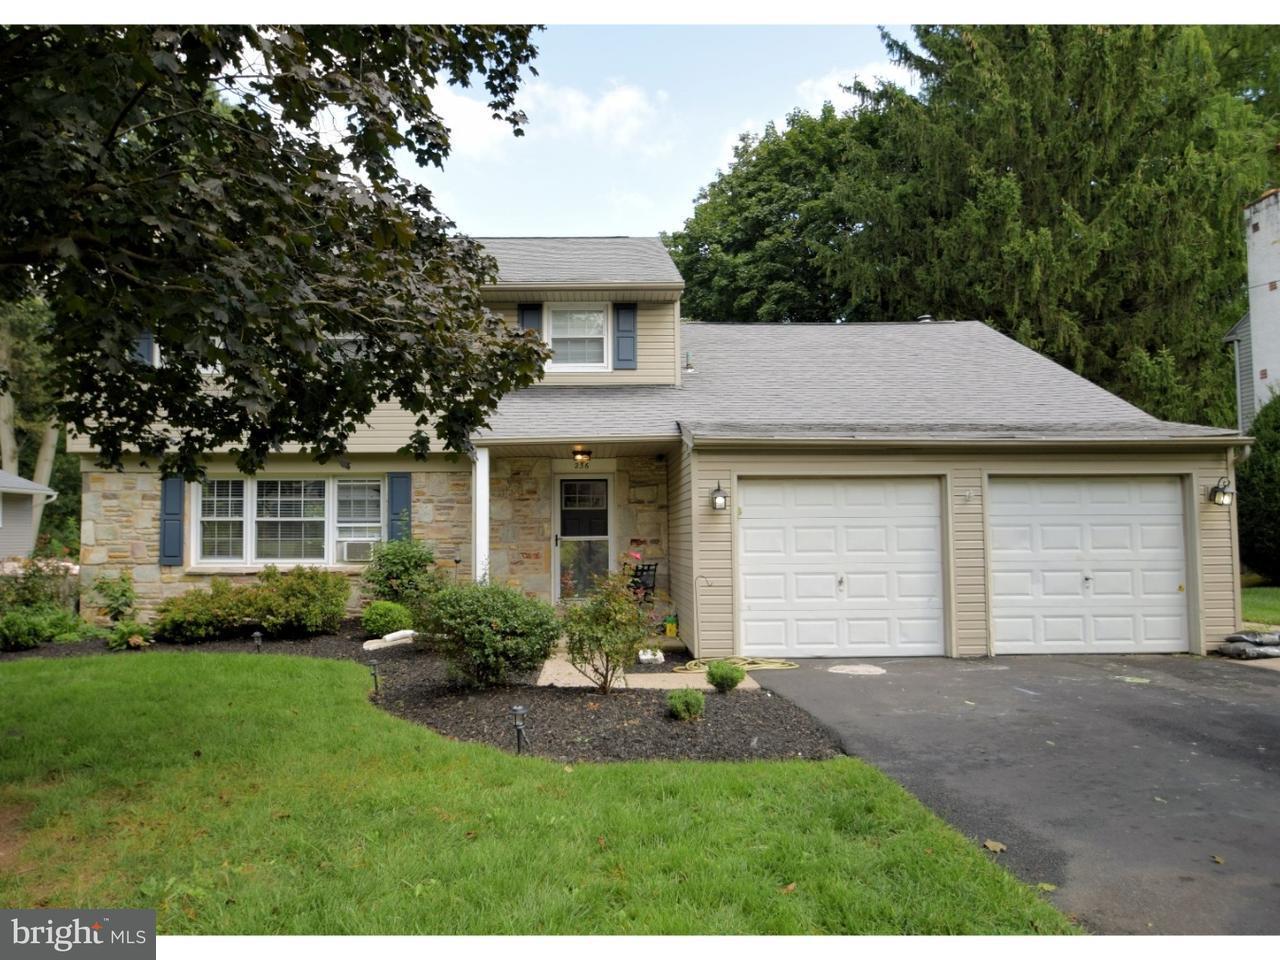 Single Family Home for Sale at 236 BEATRICE Avenue Hatboro, Pennsylvania 19040 United States